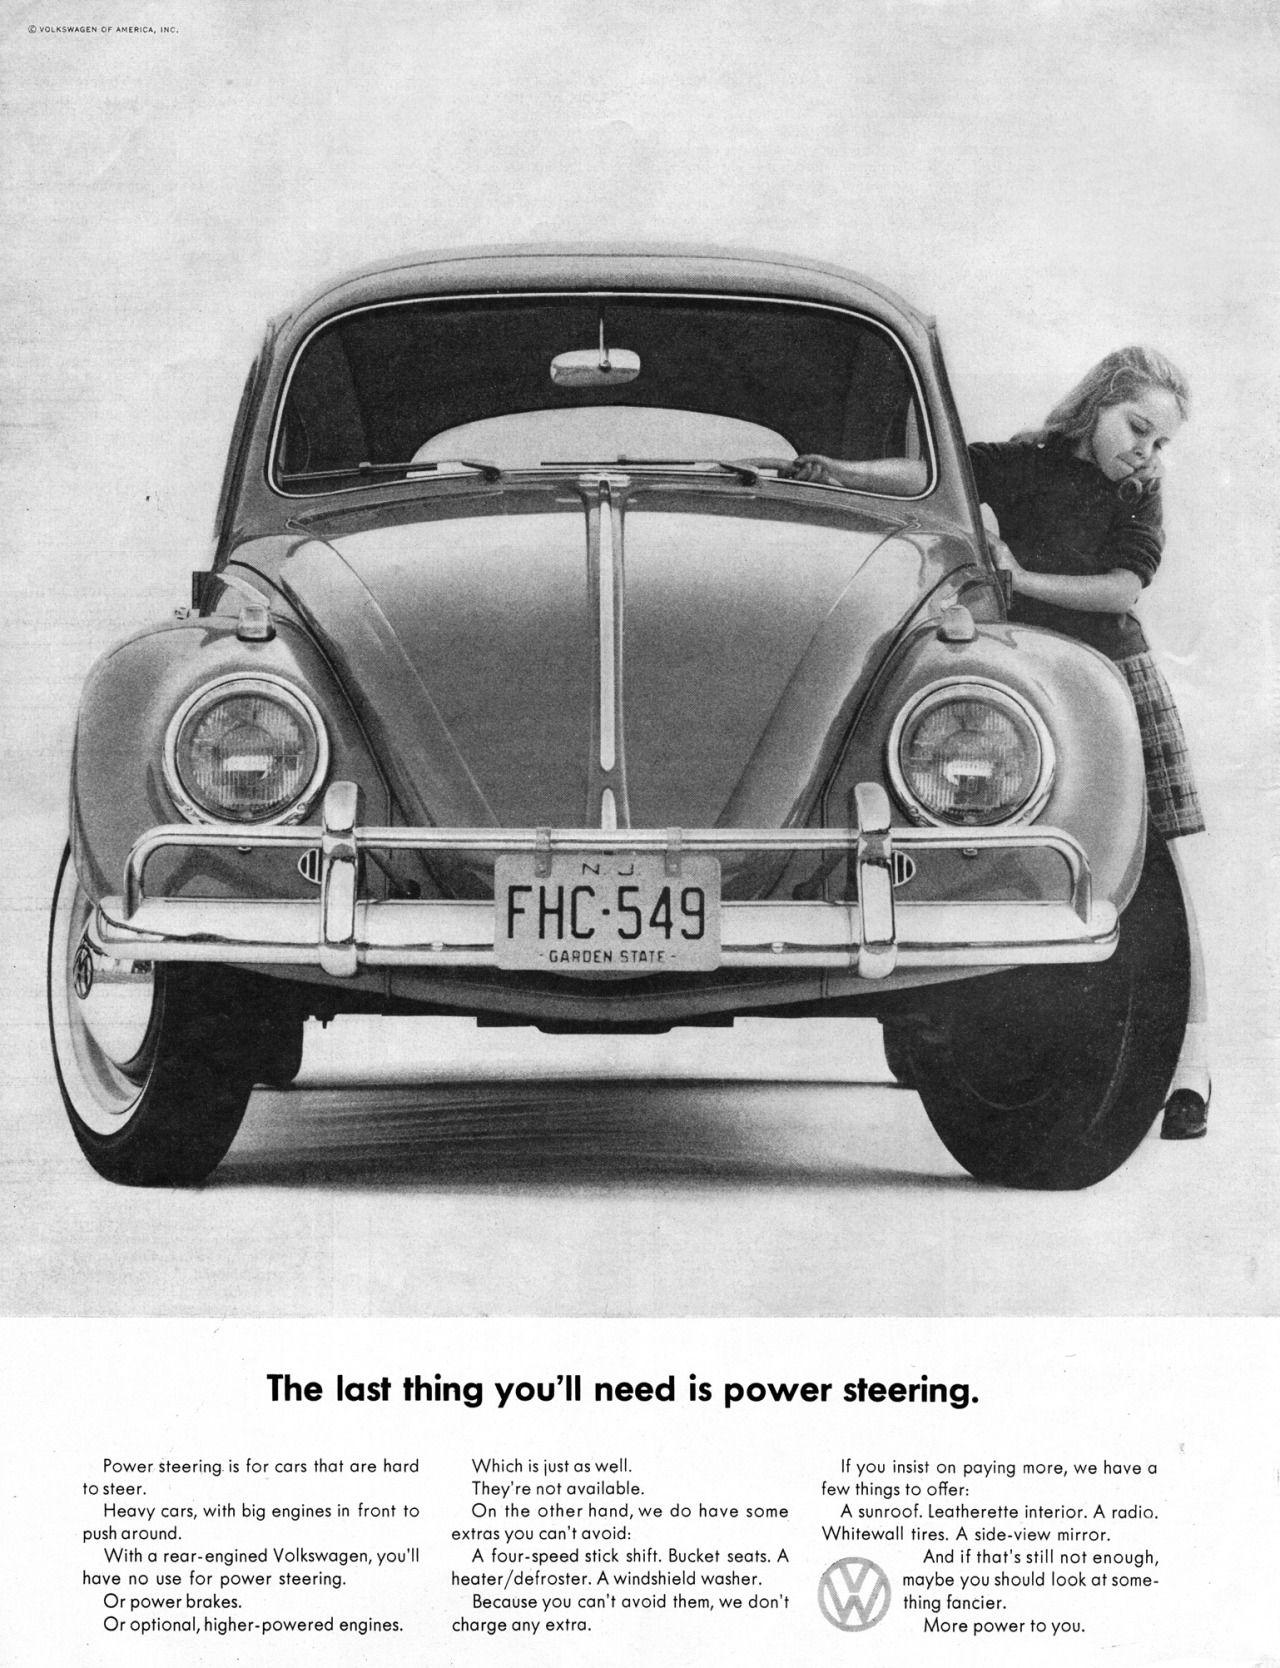 Pin By Bob Stephen On Volkswagen Vw Beetles Volkswagen Vw Cars